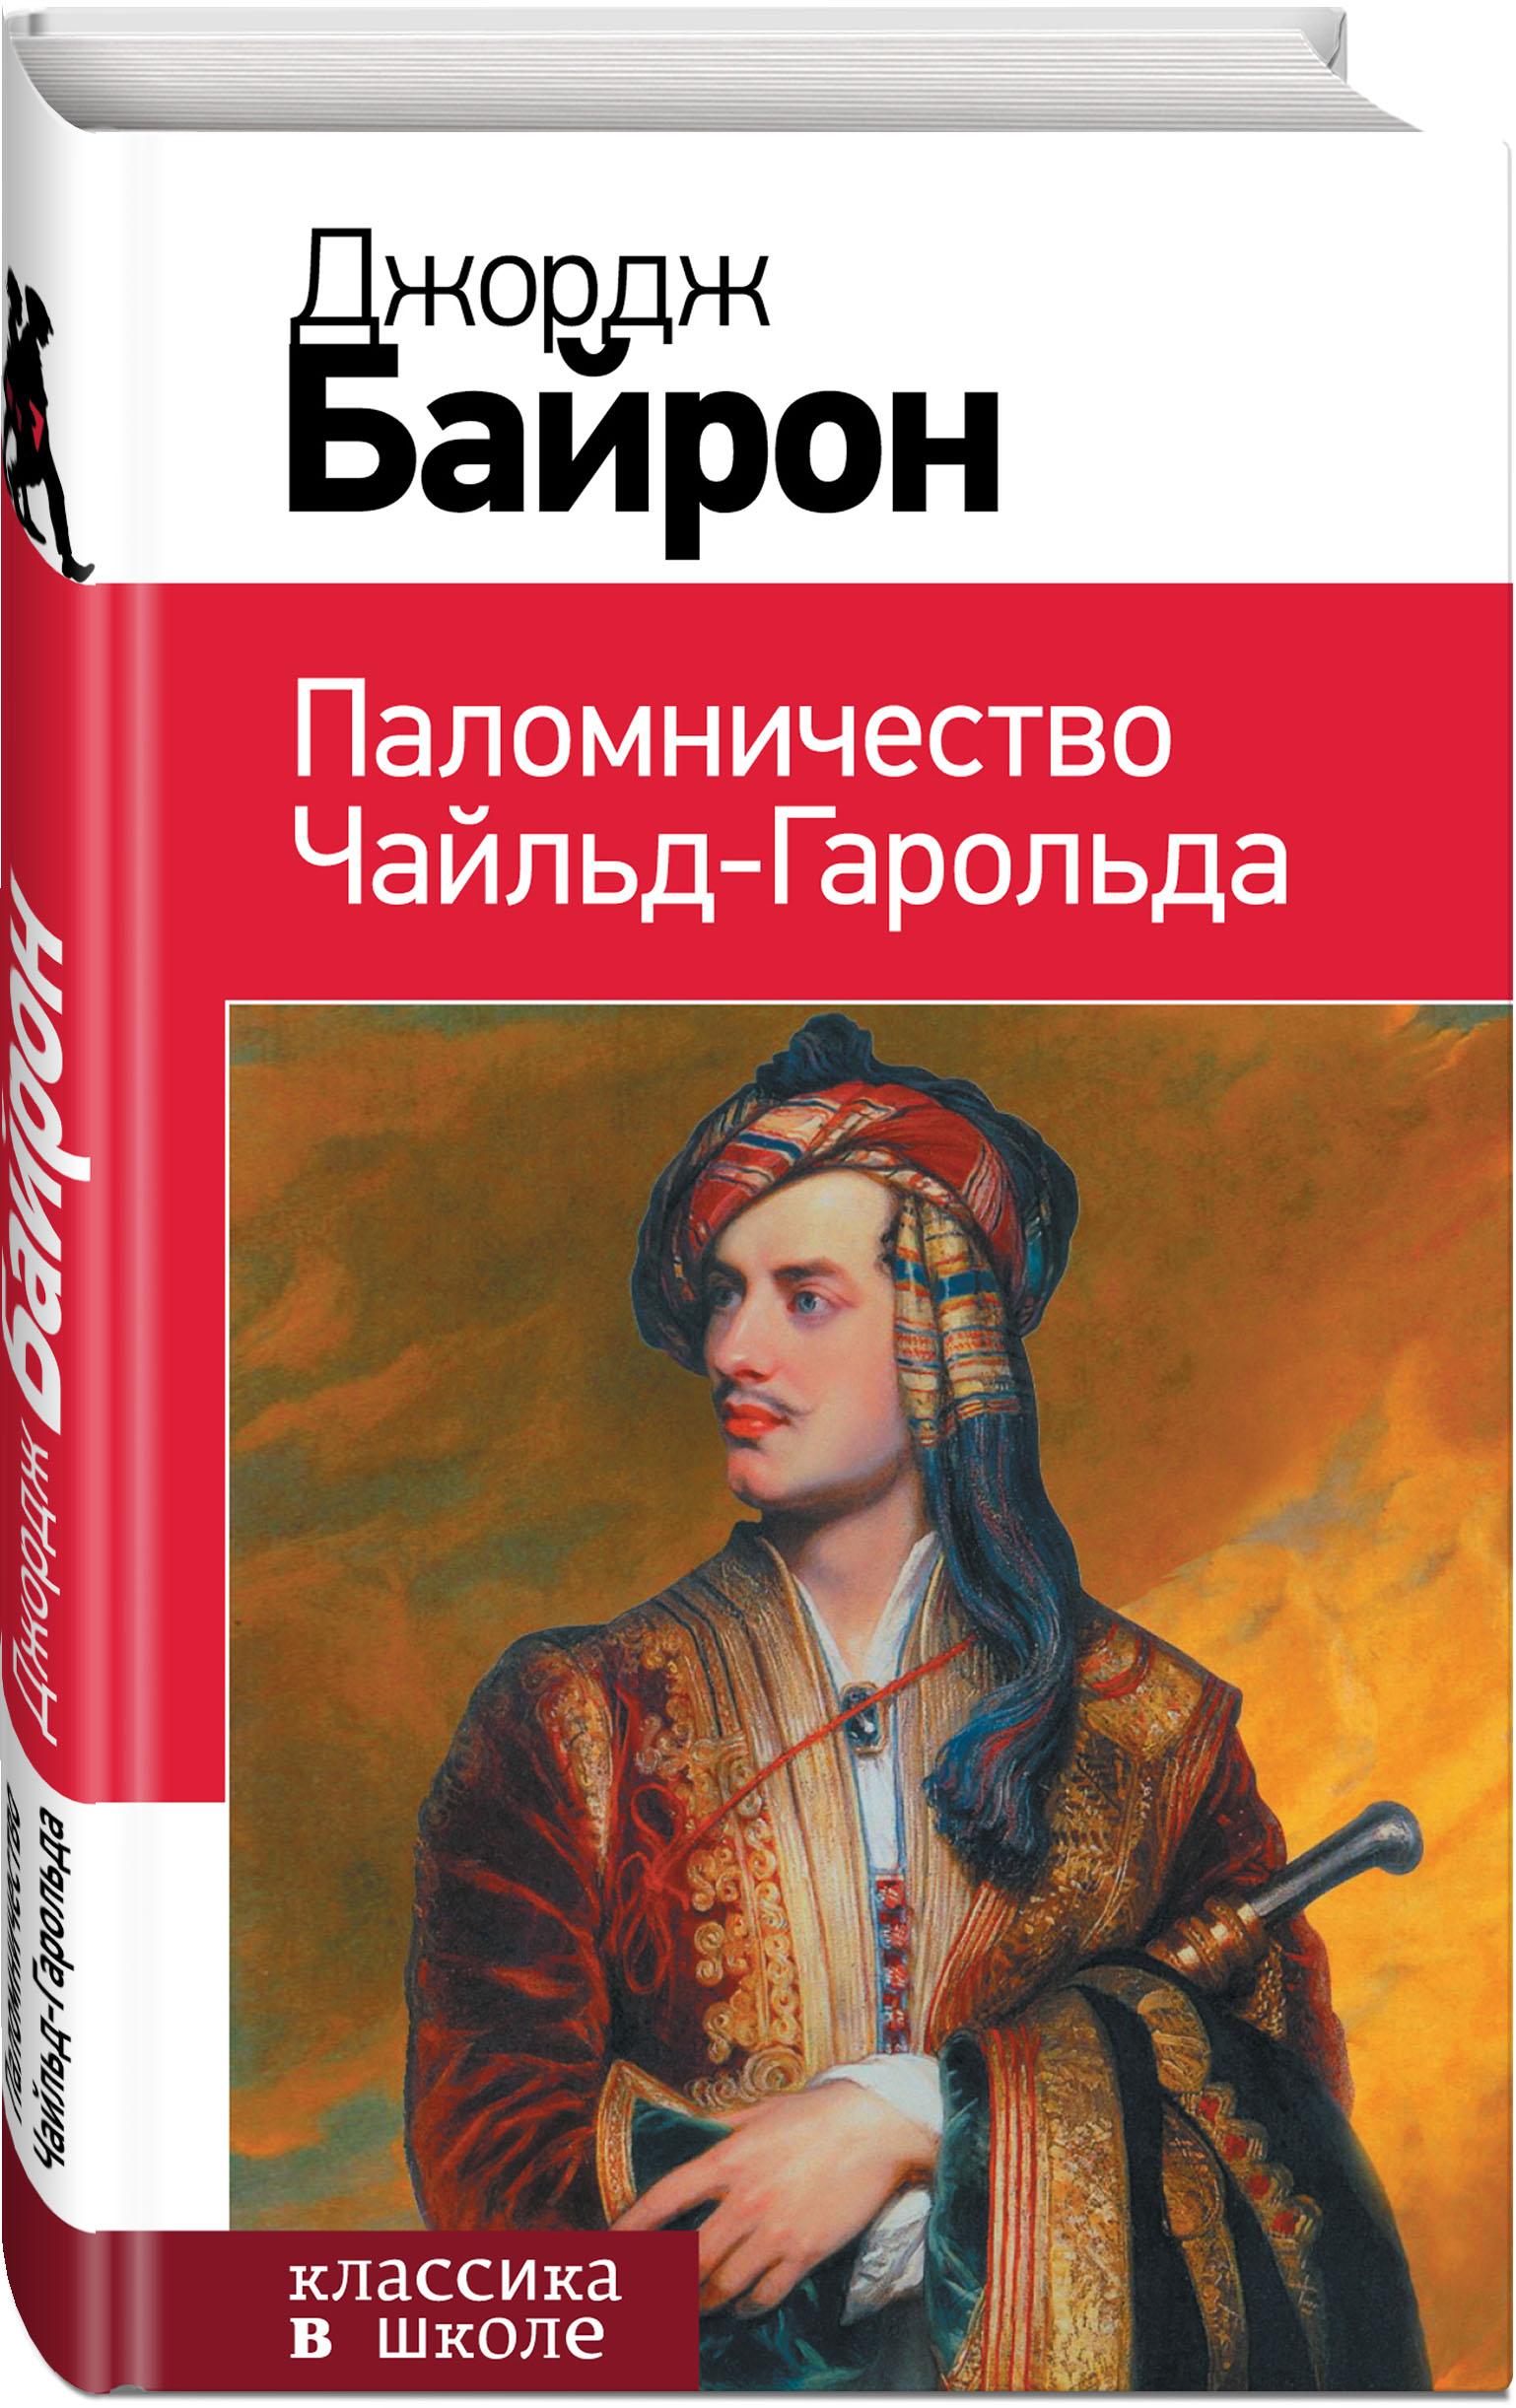 Байрон Джордж Гордон Паломничество Чайльд-Гарольда